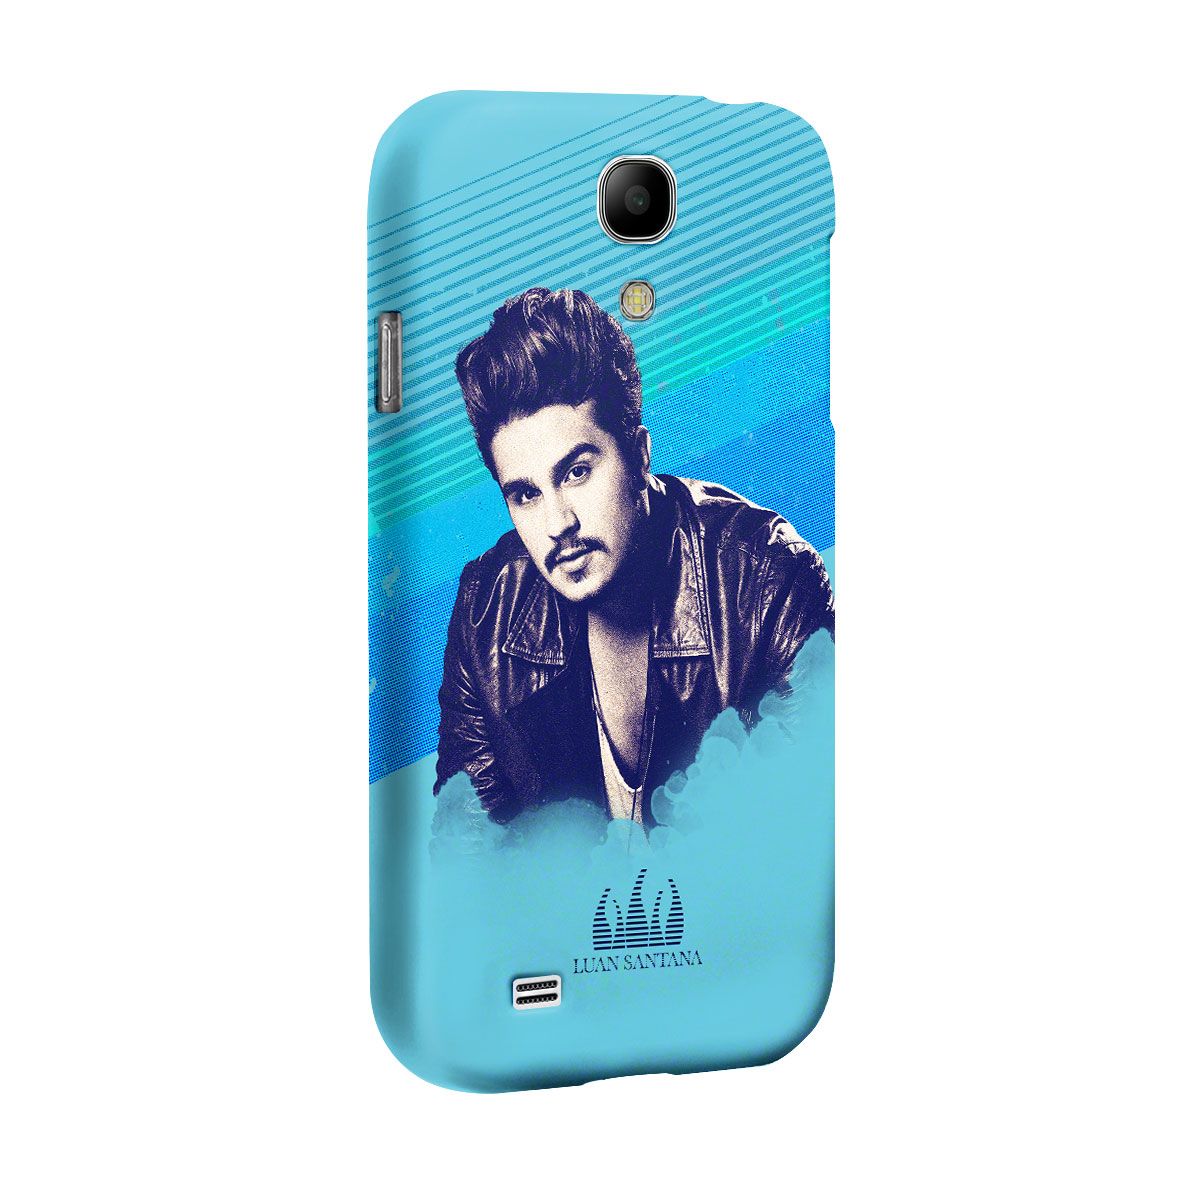 Capa de Celular Samsung Galaxy S4 Luan Santana Sky